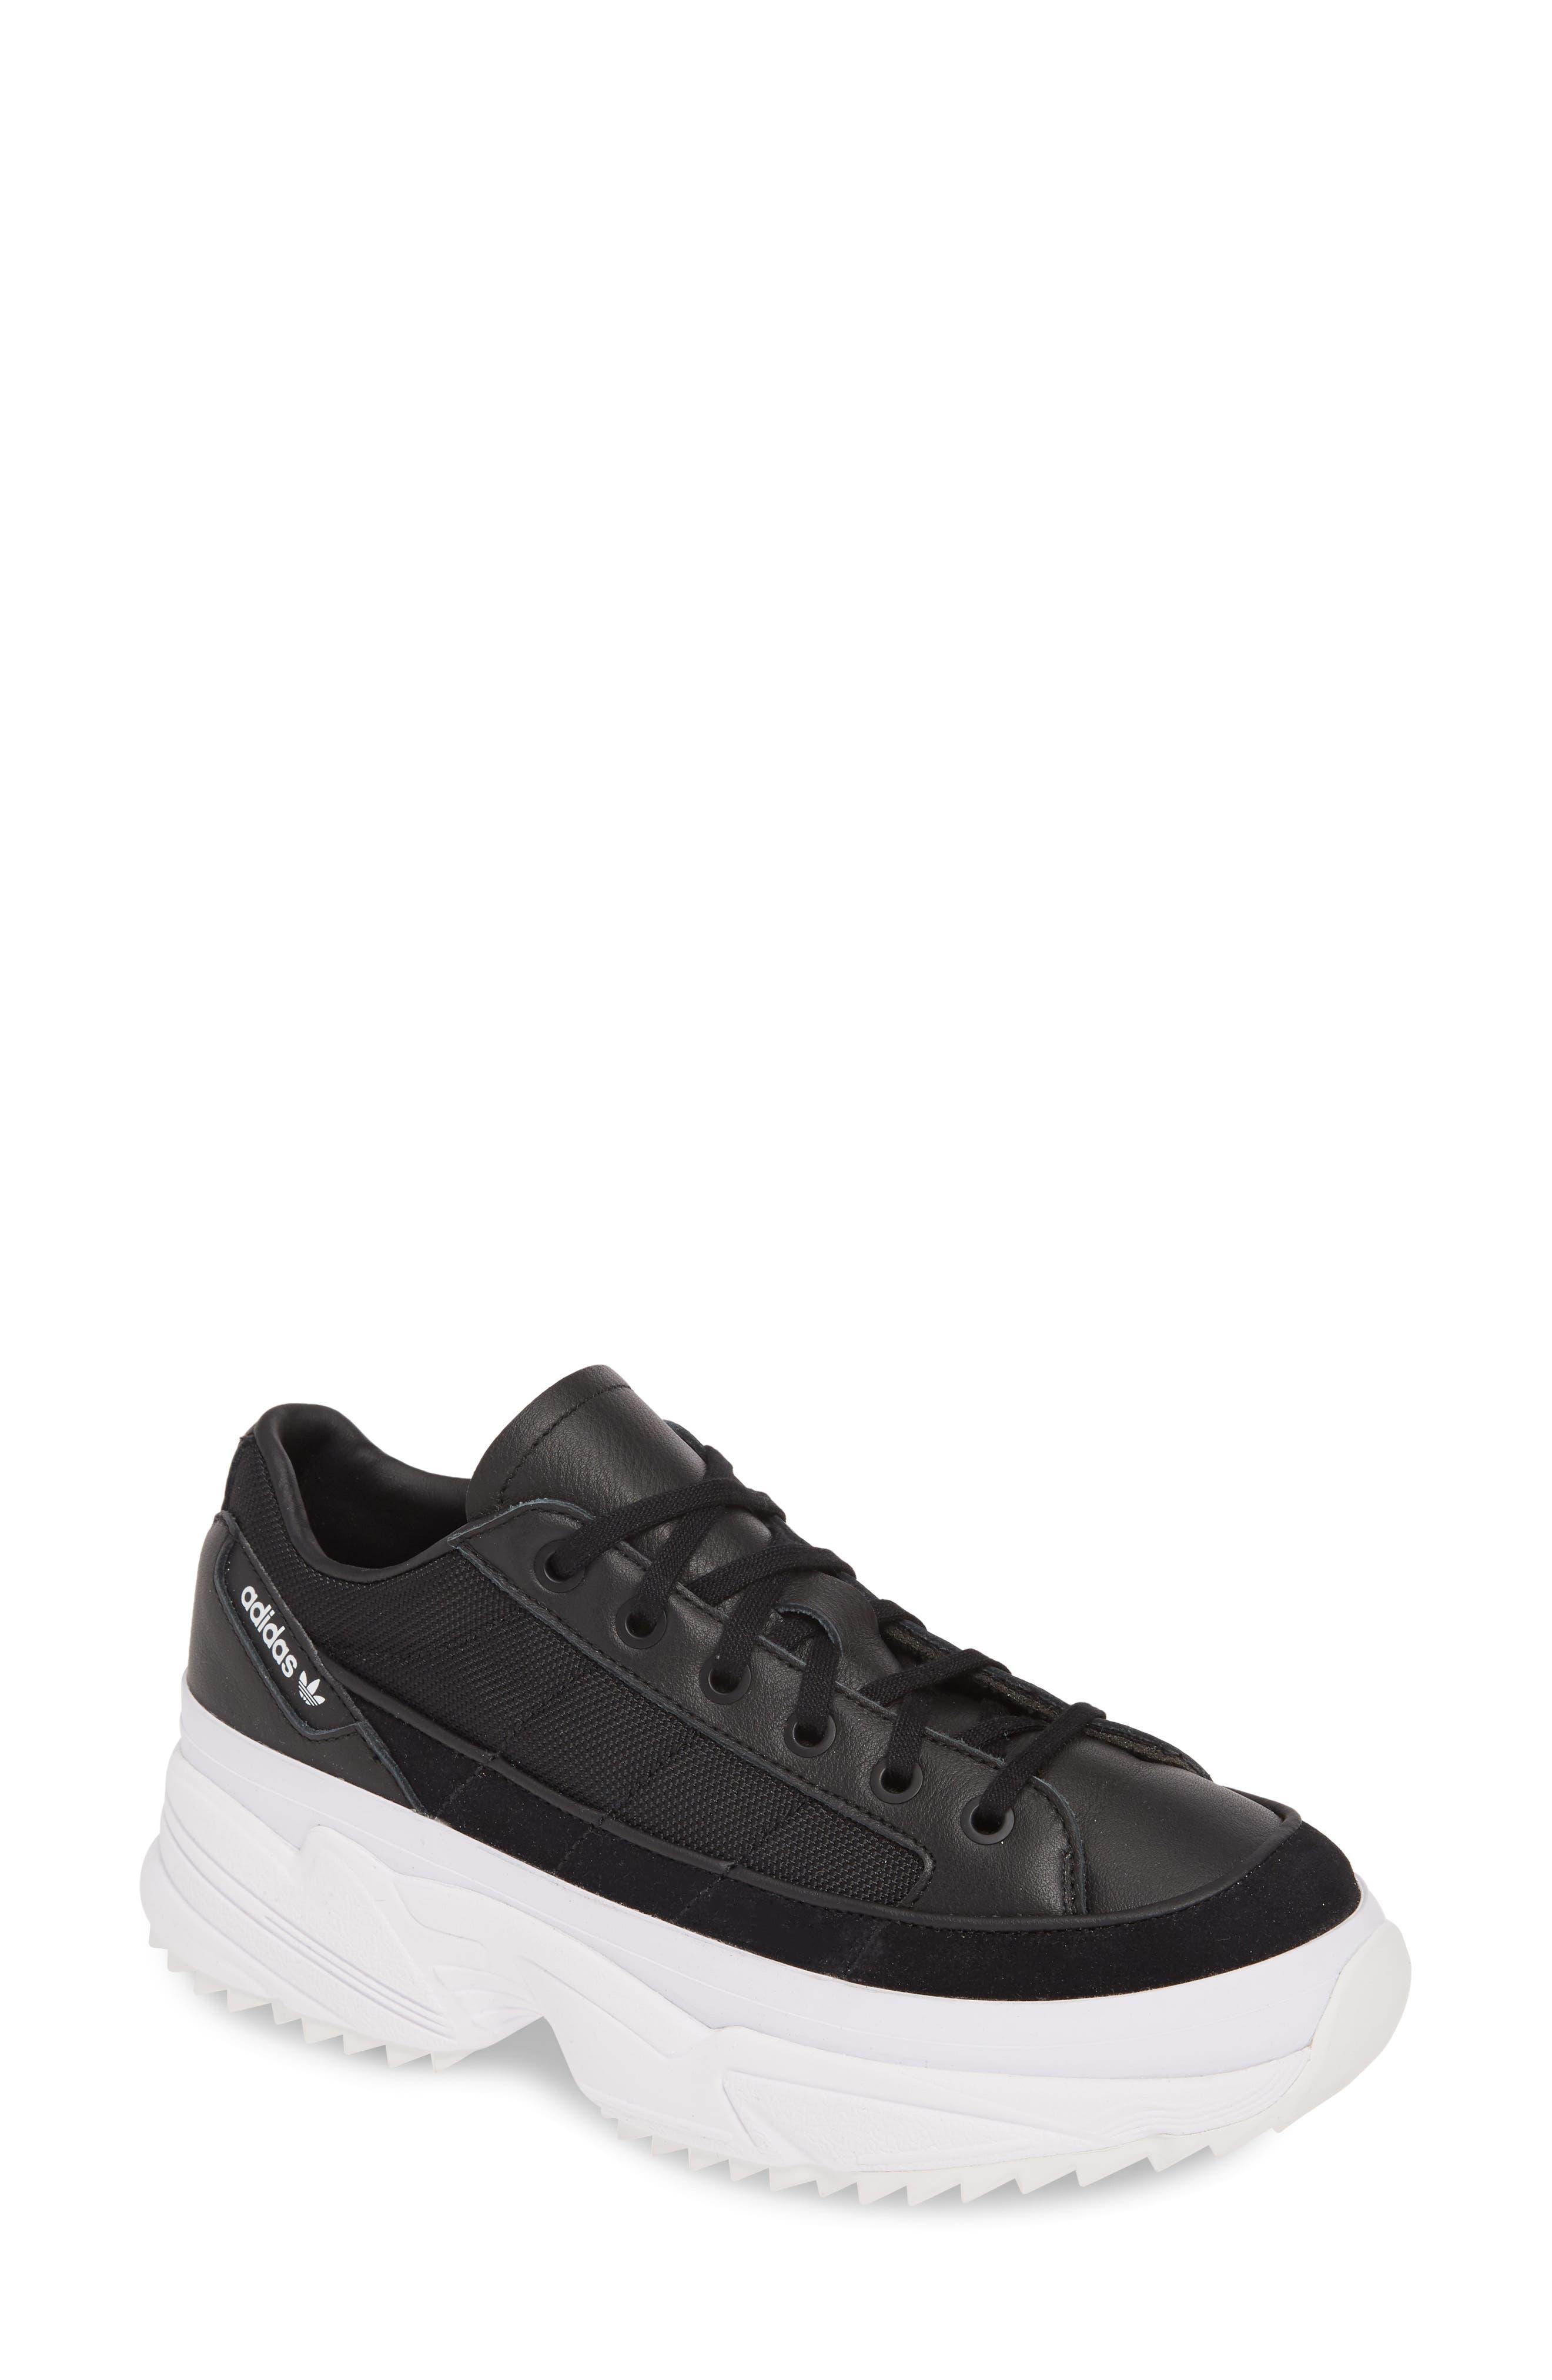 adidas Kiellor Platform Sneaker (Women